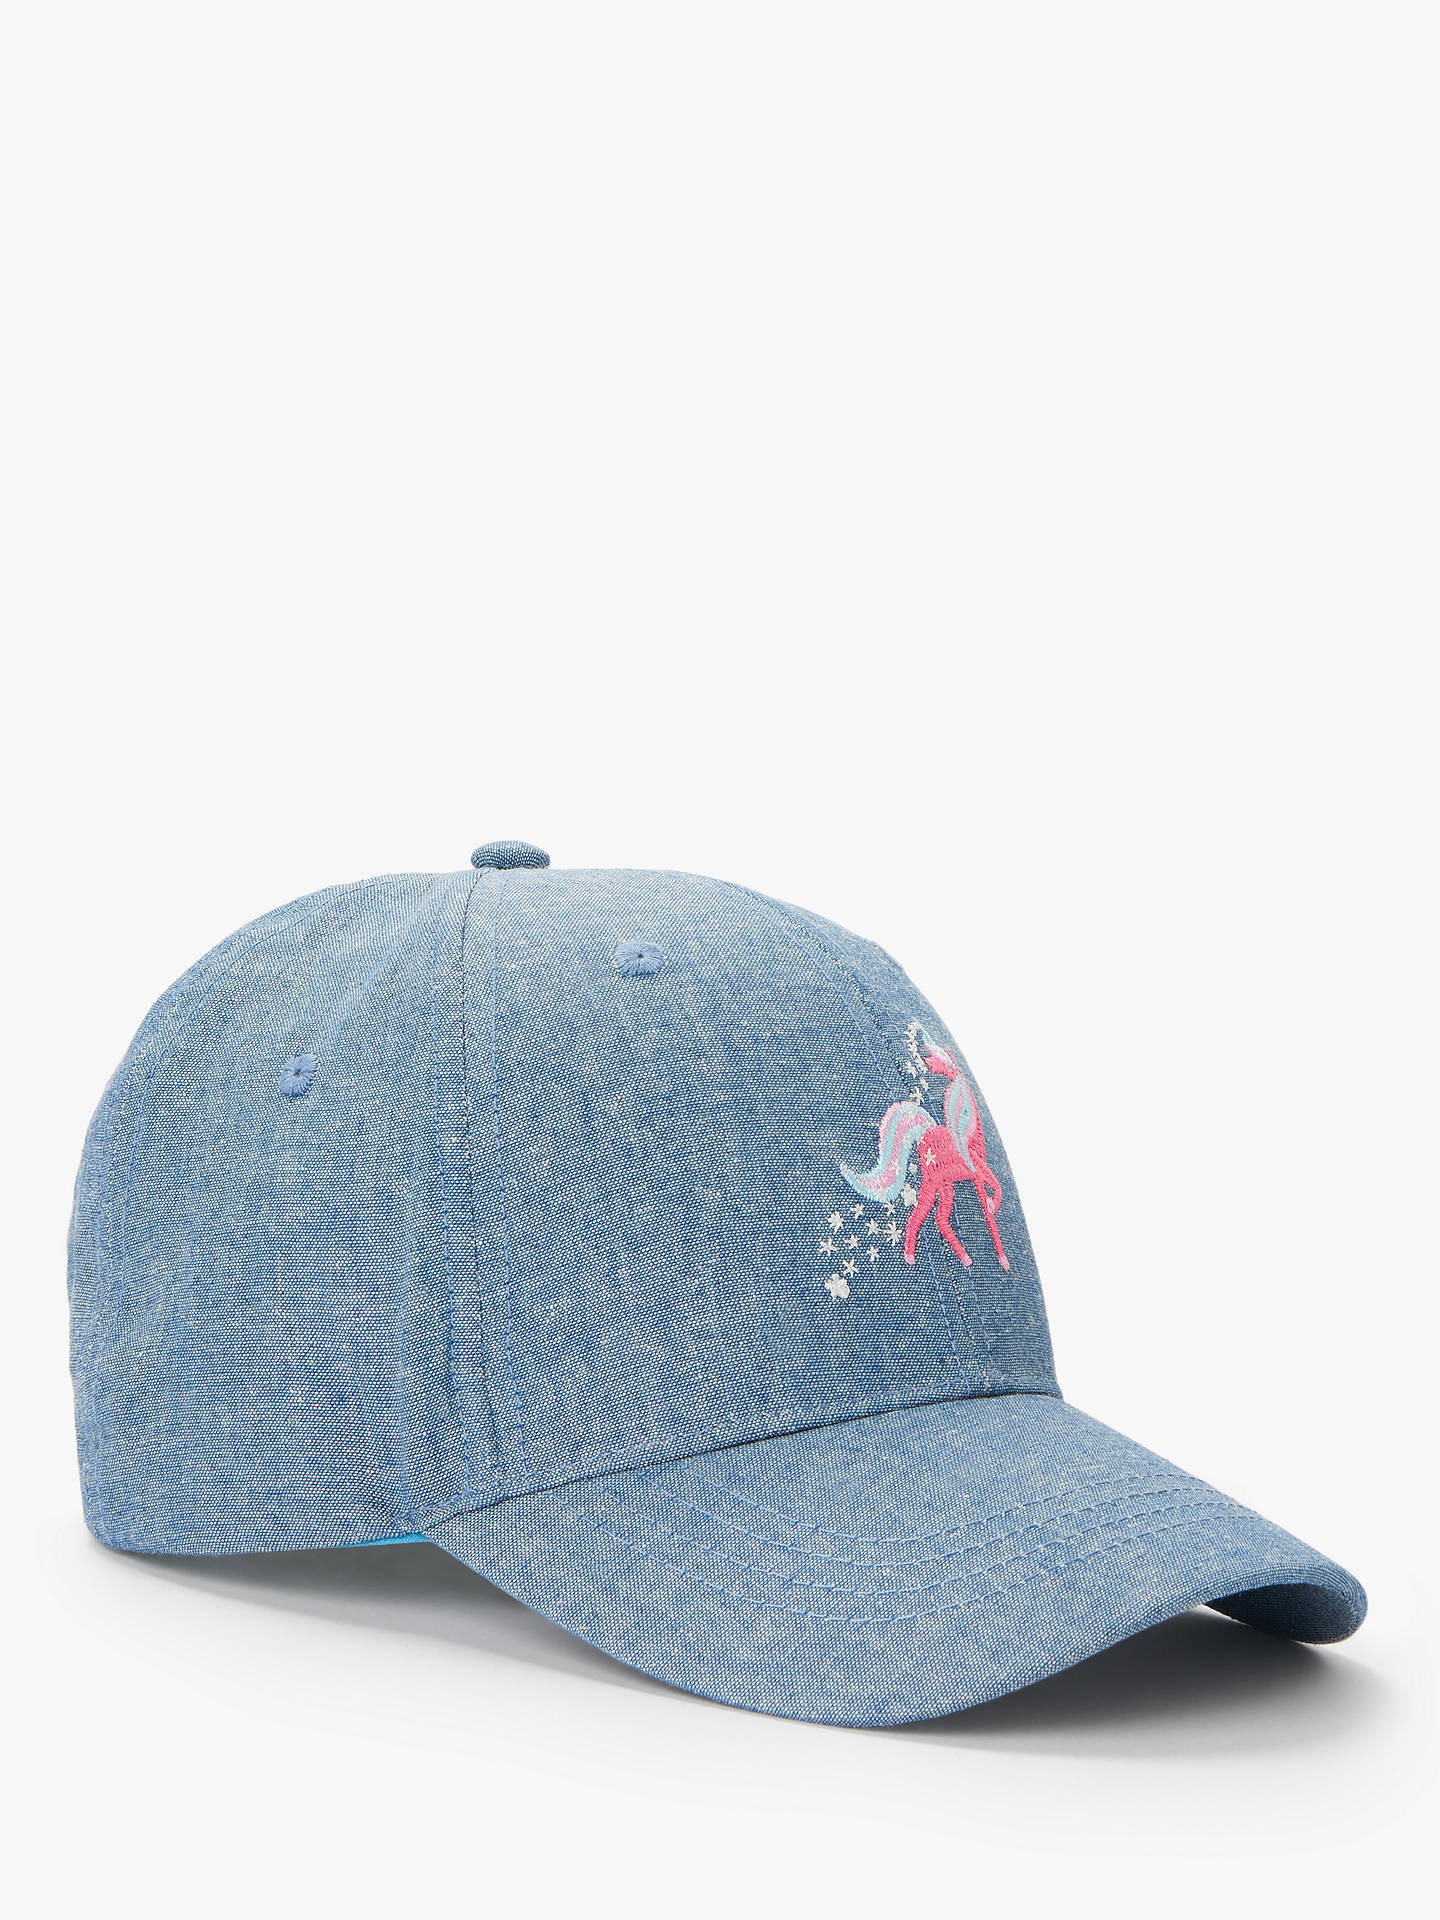 82cf2deabbb BuyJohn Lewis   Partners Children s Unicorn Chambray Cap Hat